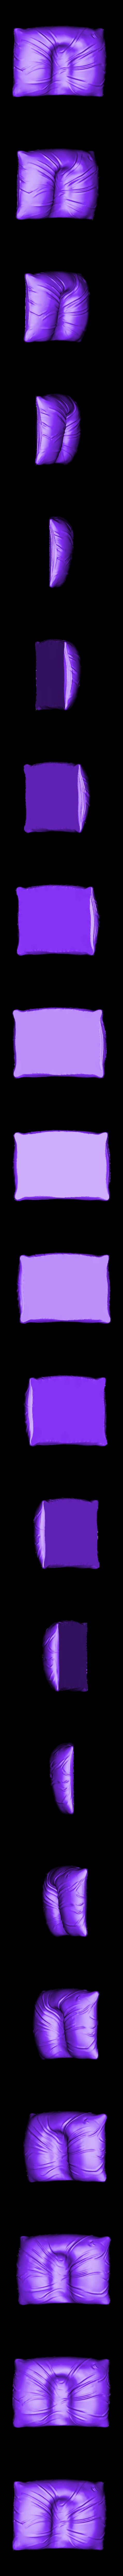 pen pillow 4.stl Download free STL file Pen Pillow • Template to 3D print, Atomicosstudio